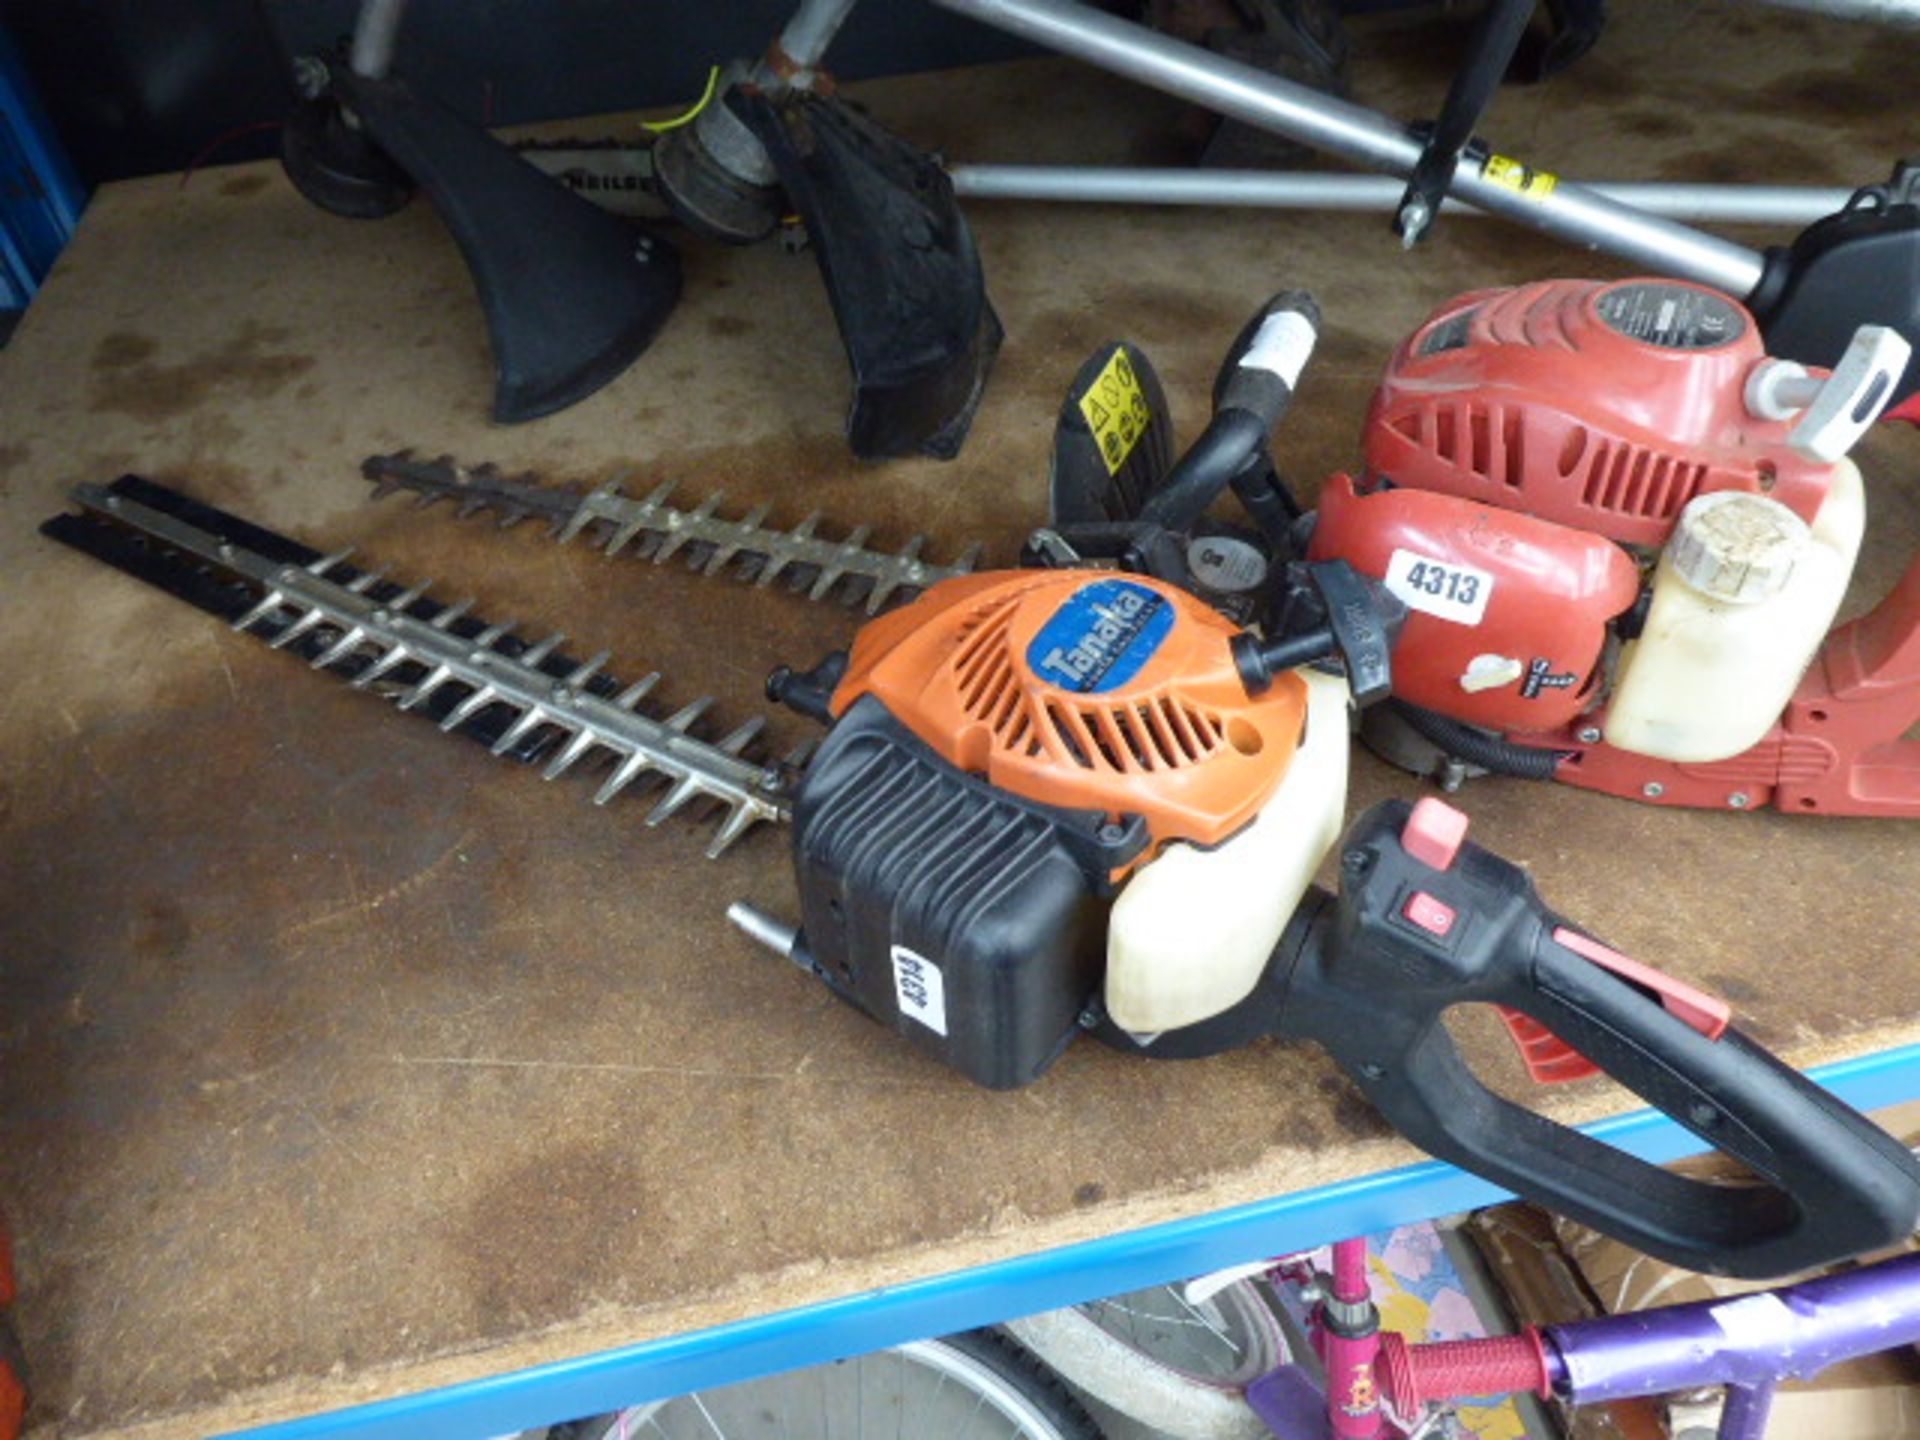 Lot 4314 - Tanaka petrol powered hedge cutter